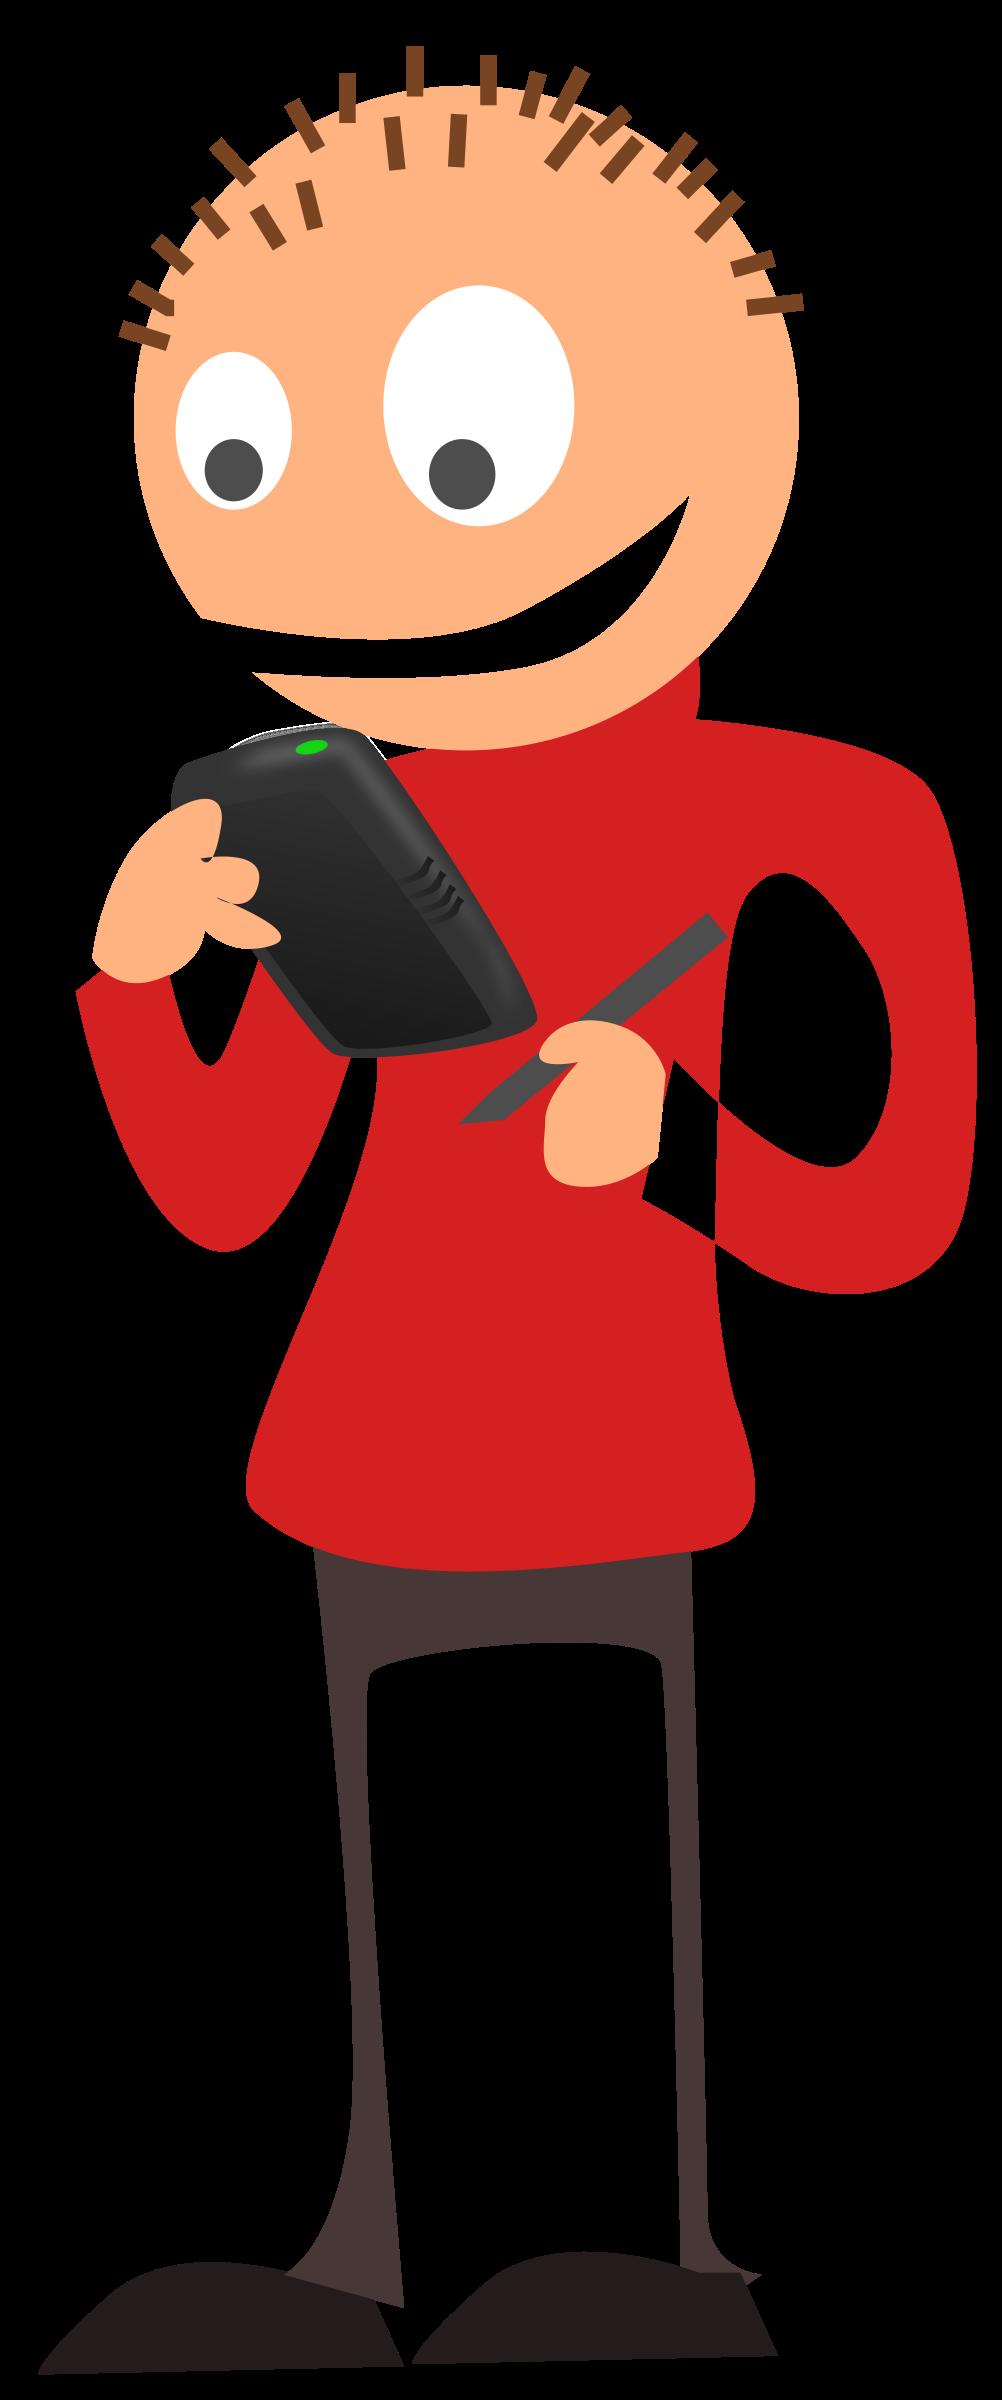 Telephone person